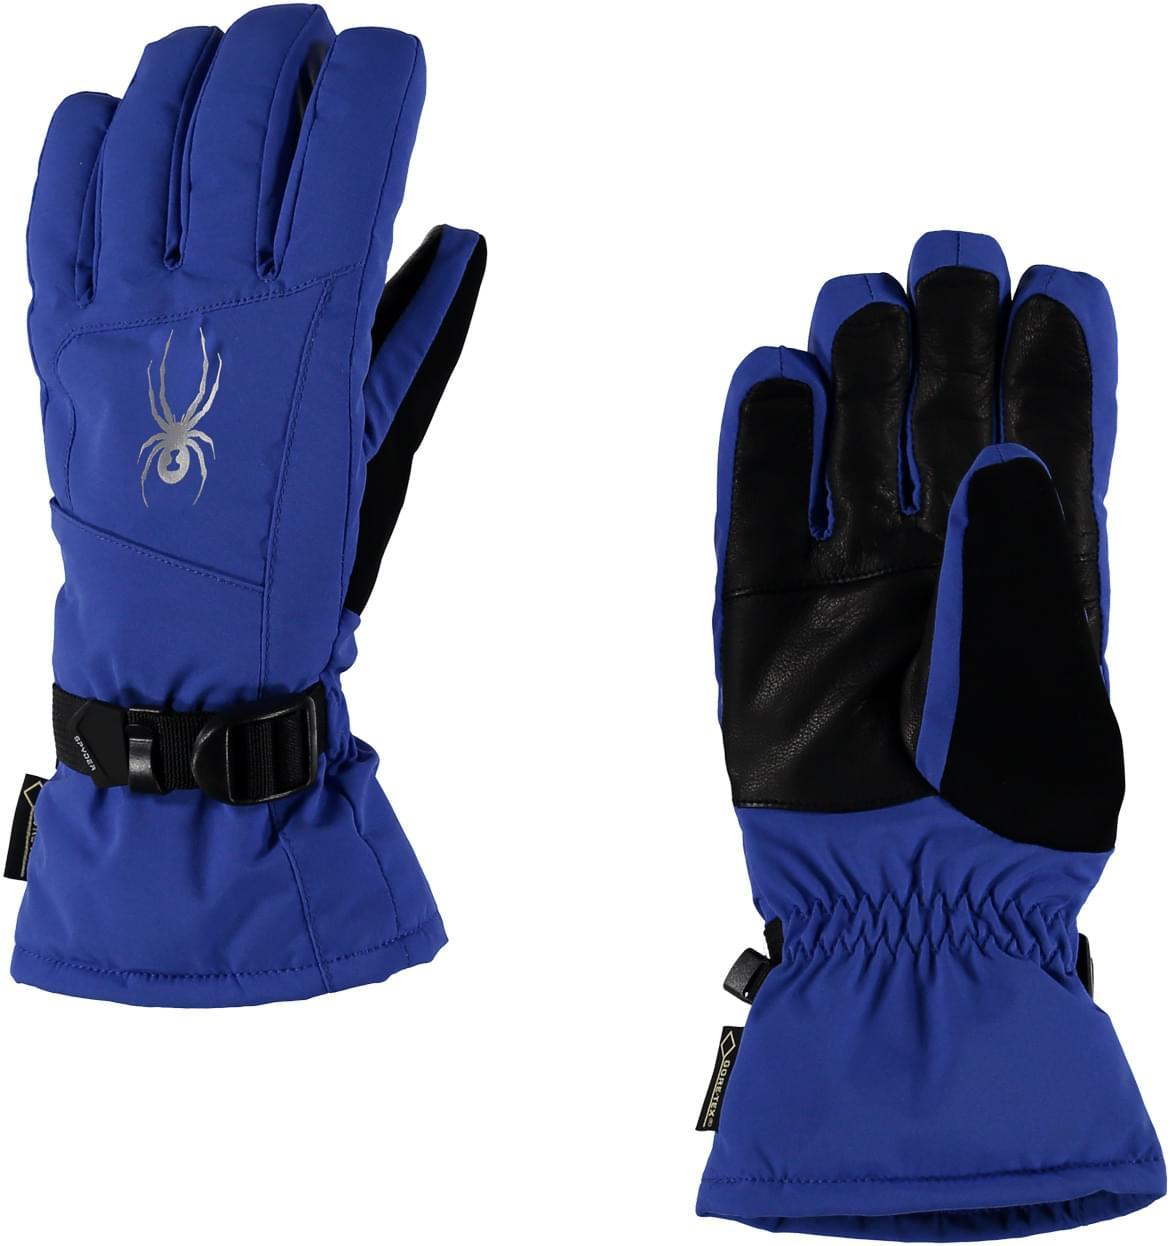 Dámské lyžařské rukavice Spyder Women  039 s Synthesis Gore-Tex –  blg silver S b41bc99ae6